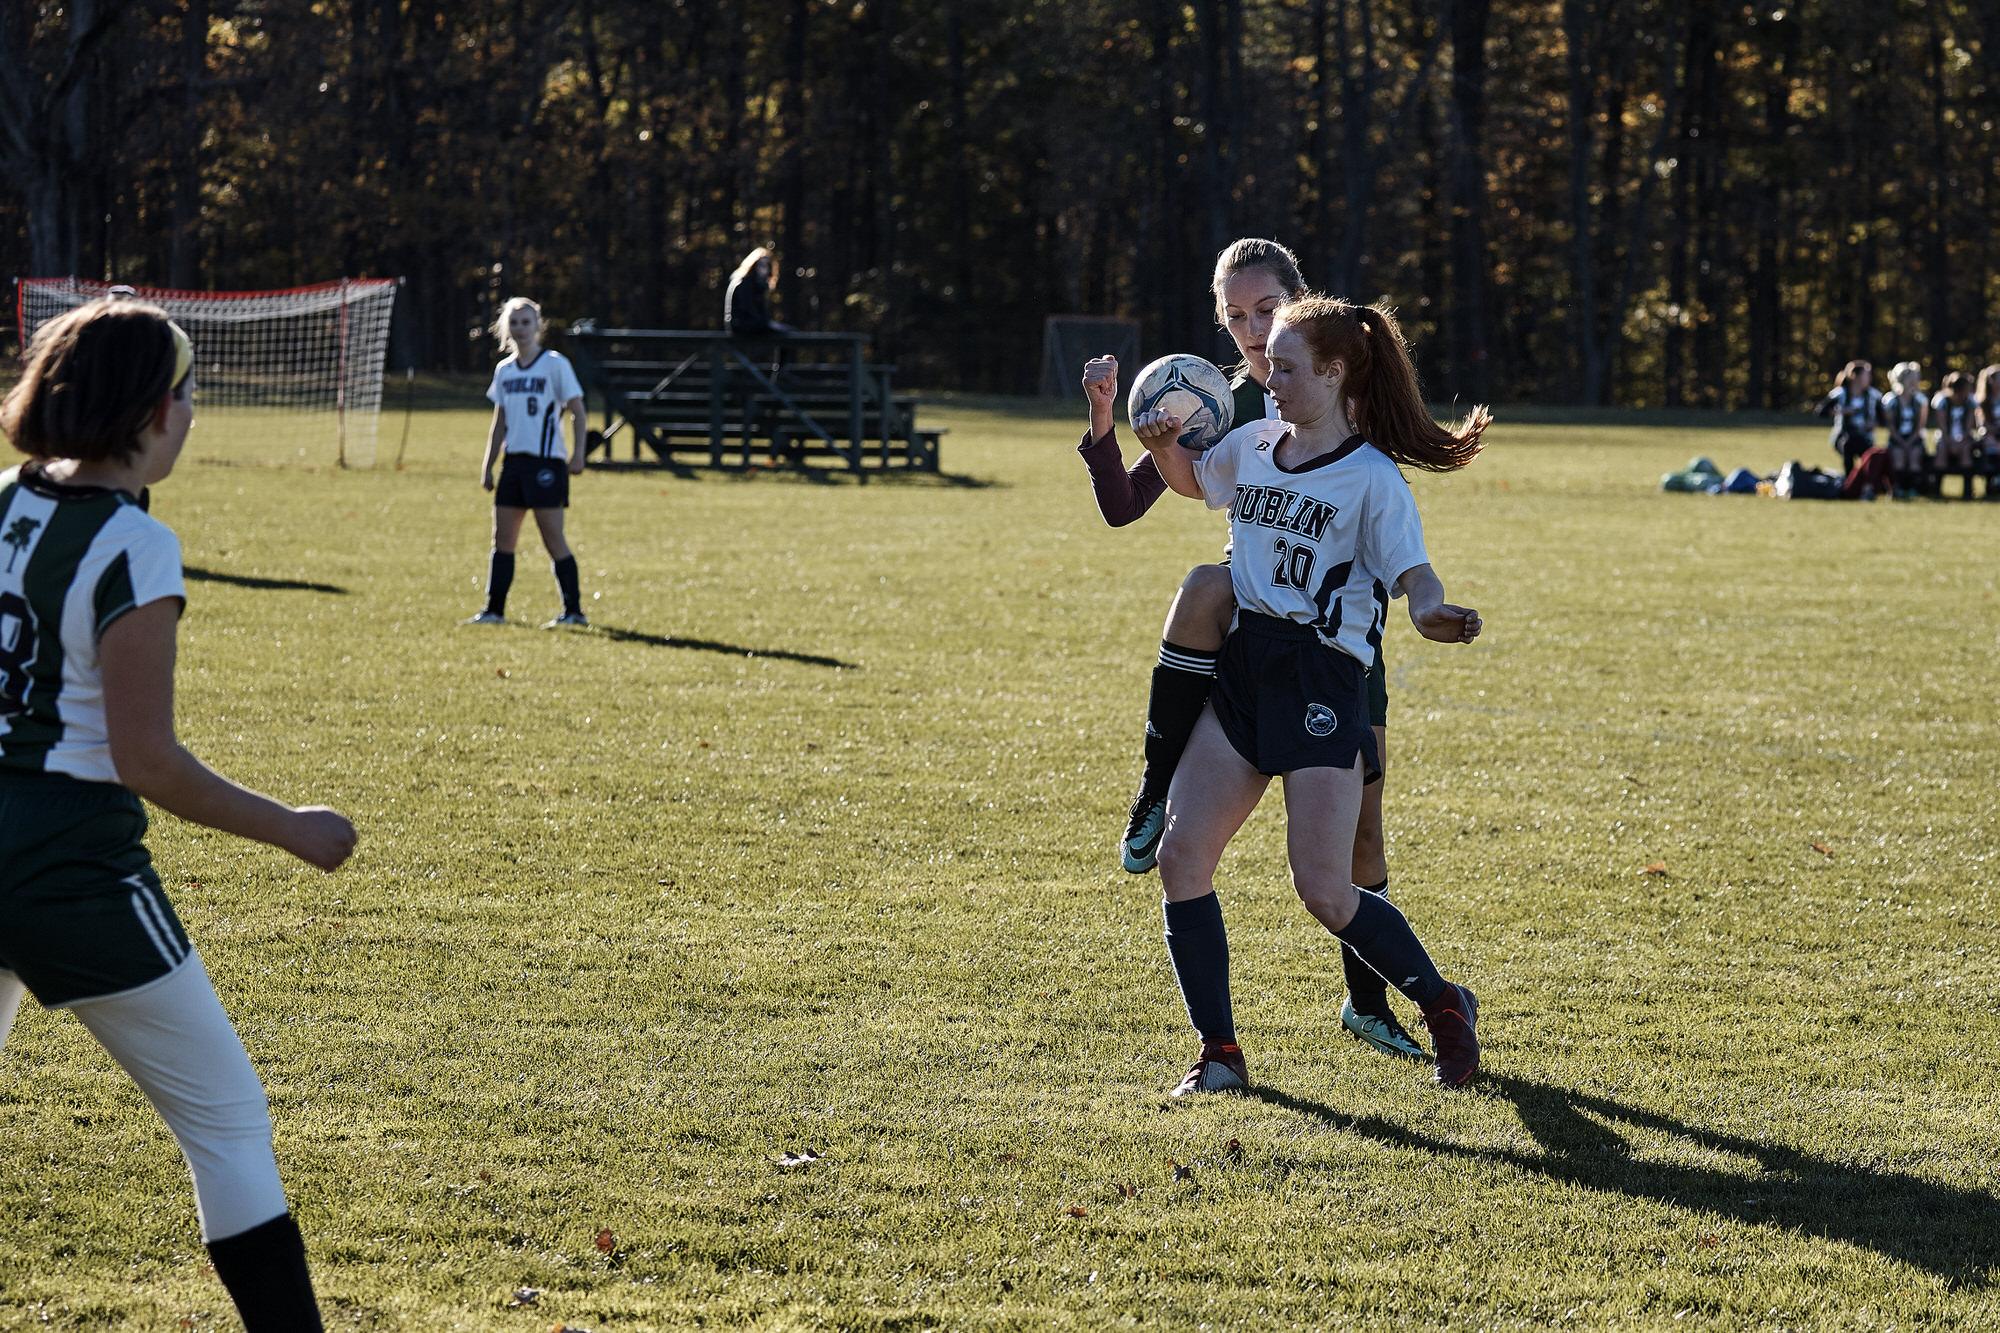 Girls Varsity Soccer vs. Putney School - October 26, 2018 - 023.jpg